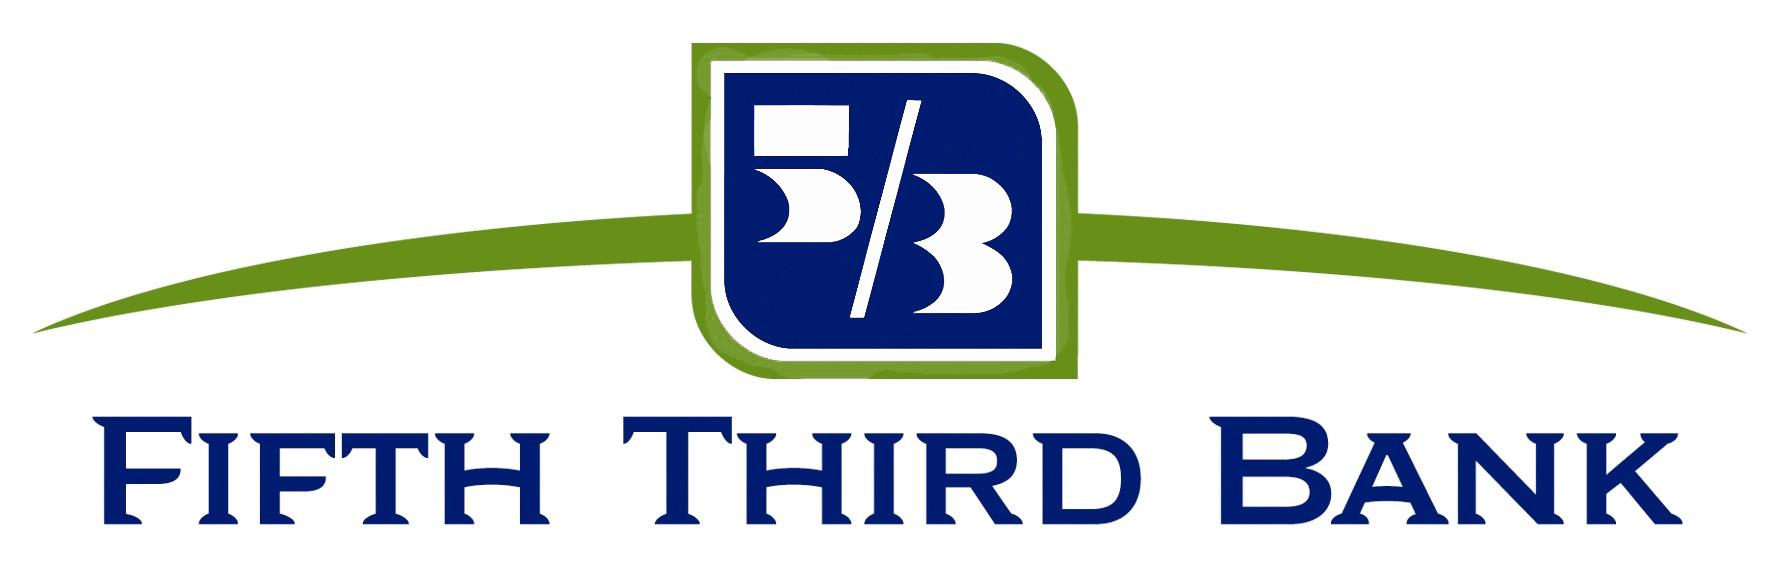 fifth-third-bank_logo.png